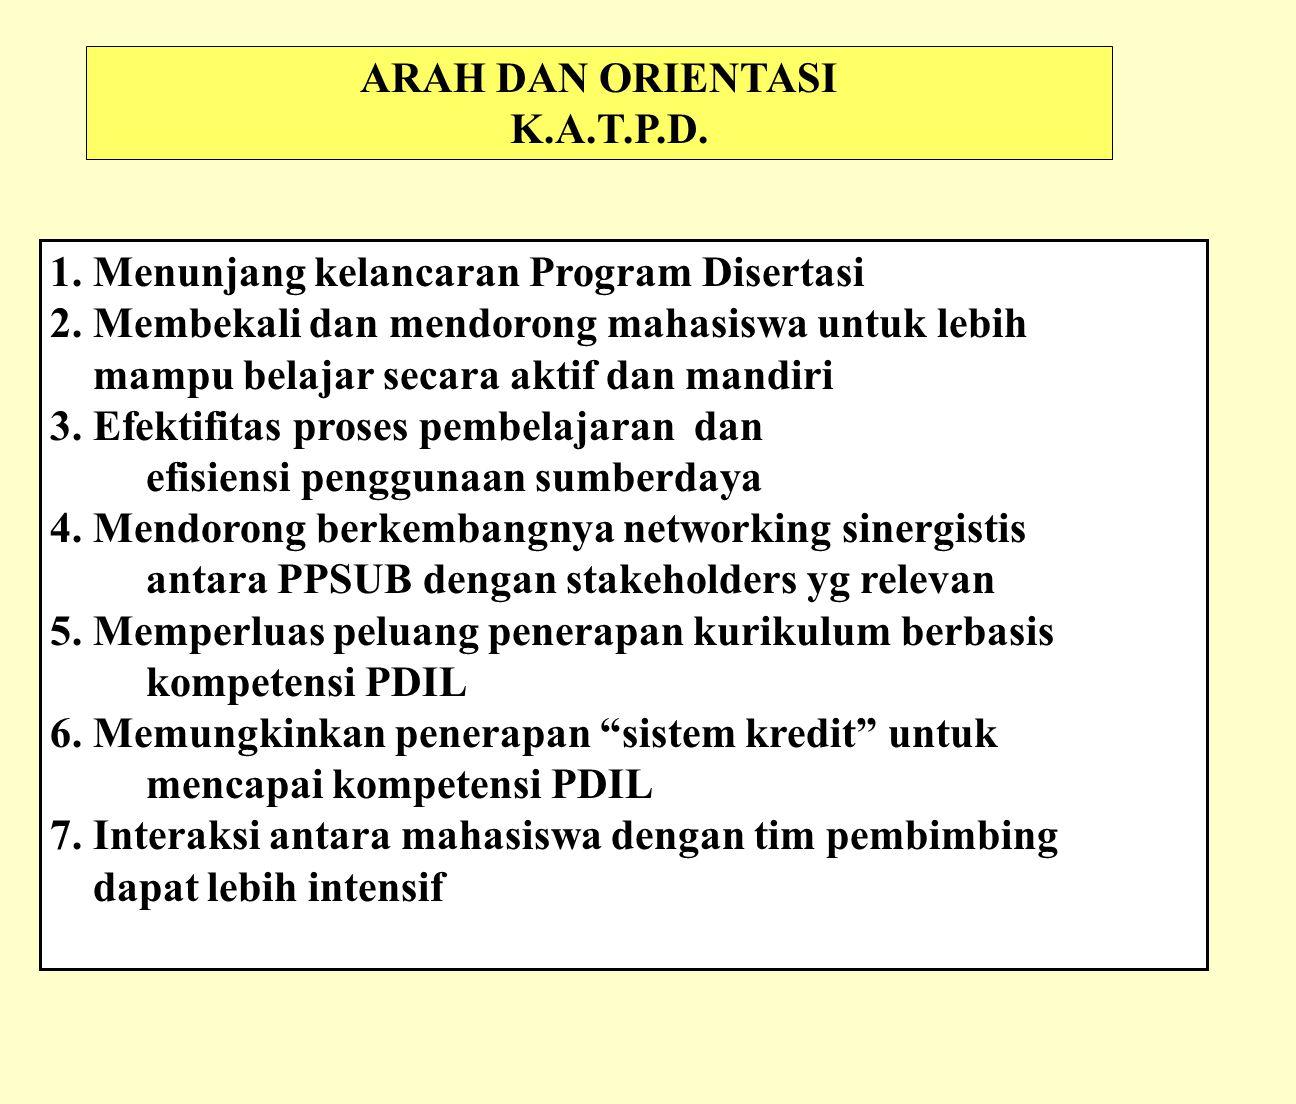 ARAH DAN ORIENTASI K.A.T.P.D. 1. Menunjang kelancaran Program Disertasi. 2. Membekali dan mendorong mahasiswa untuk lebih.